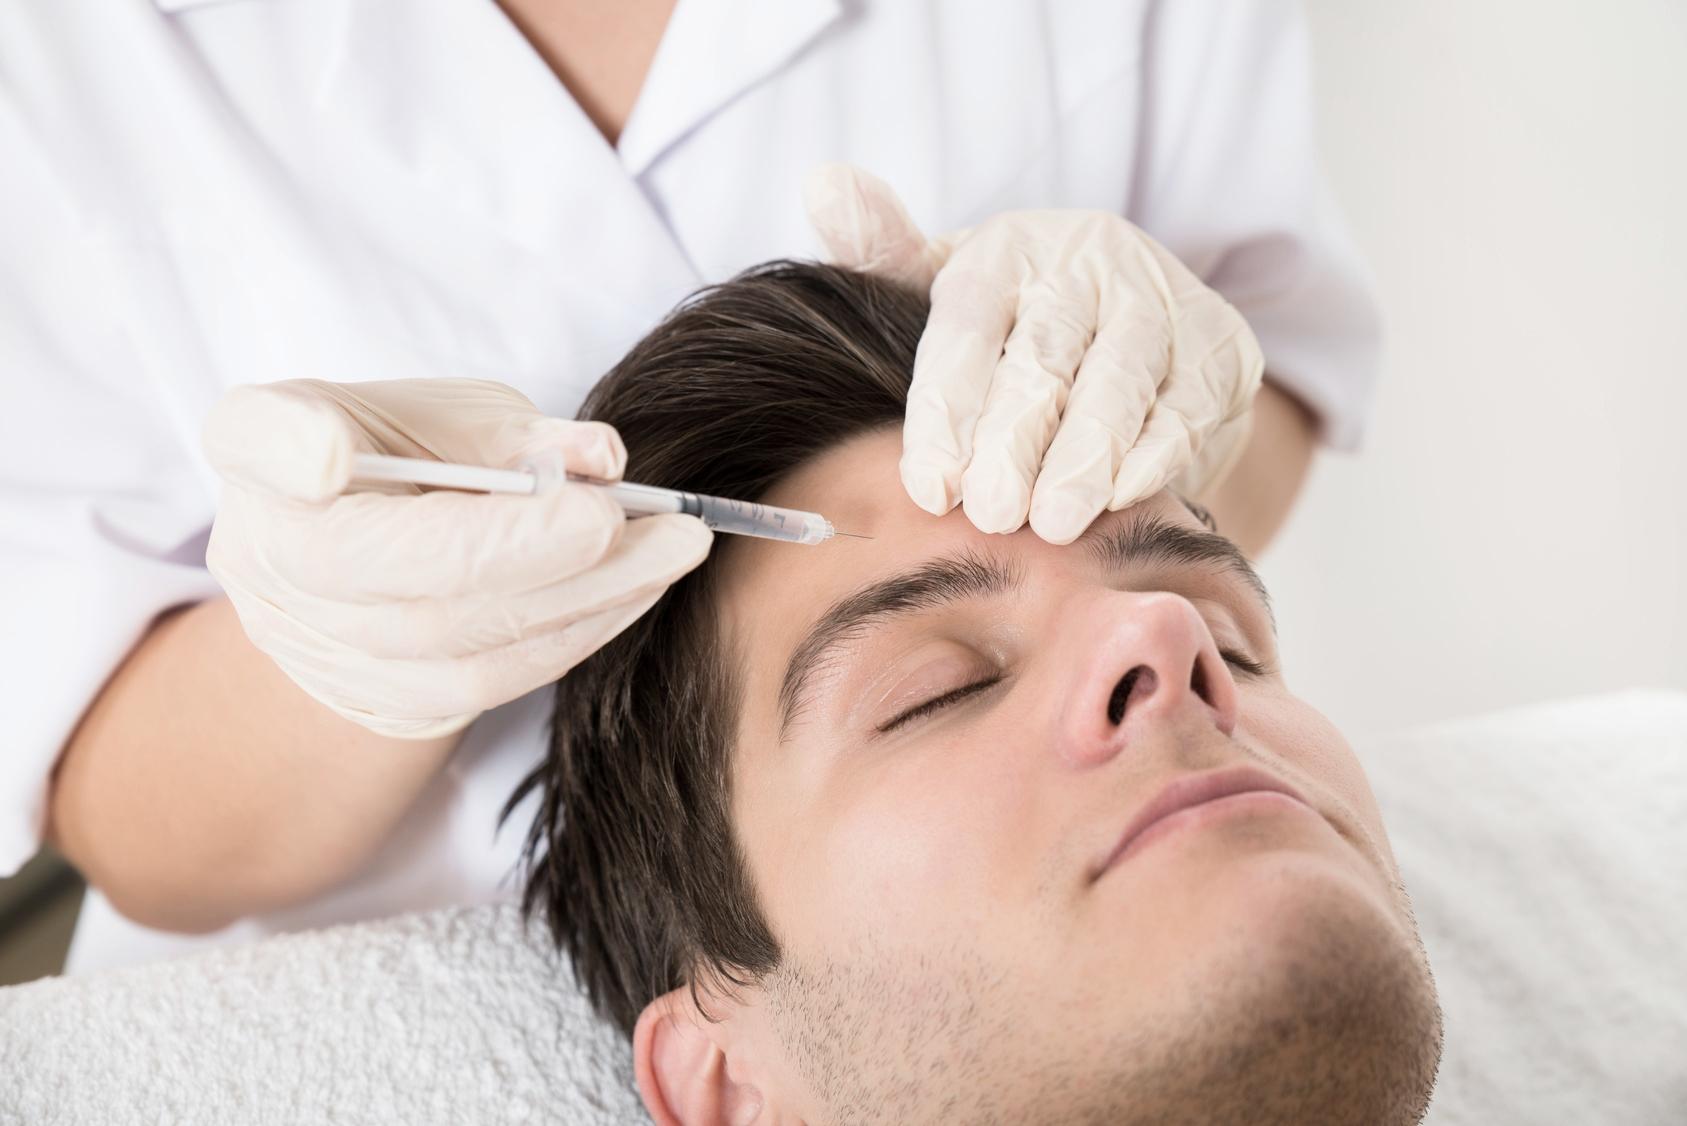 Man having Botox injections at the dentist